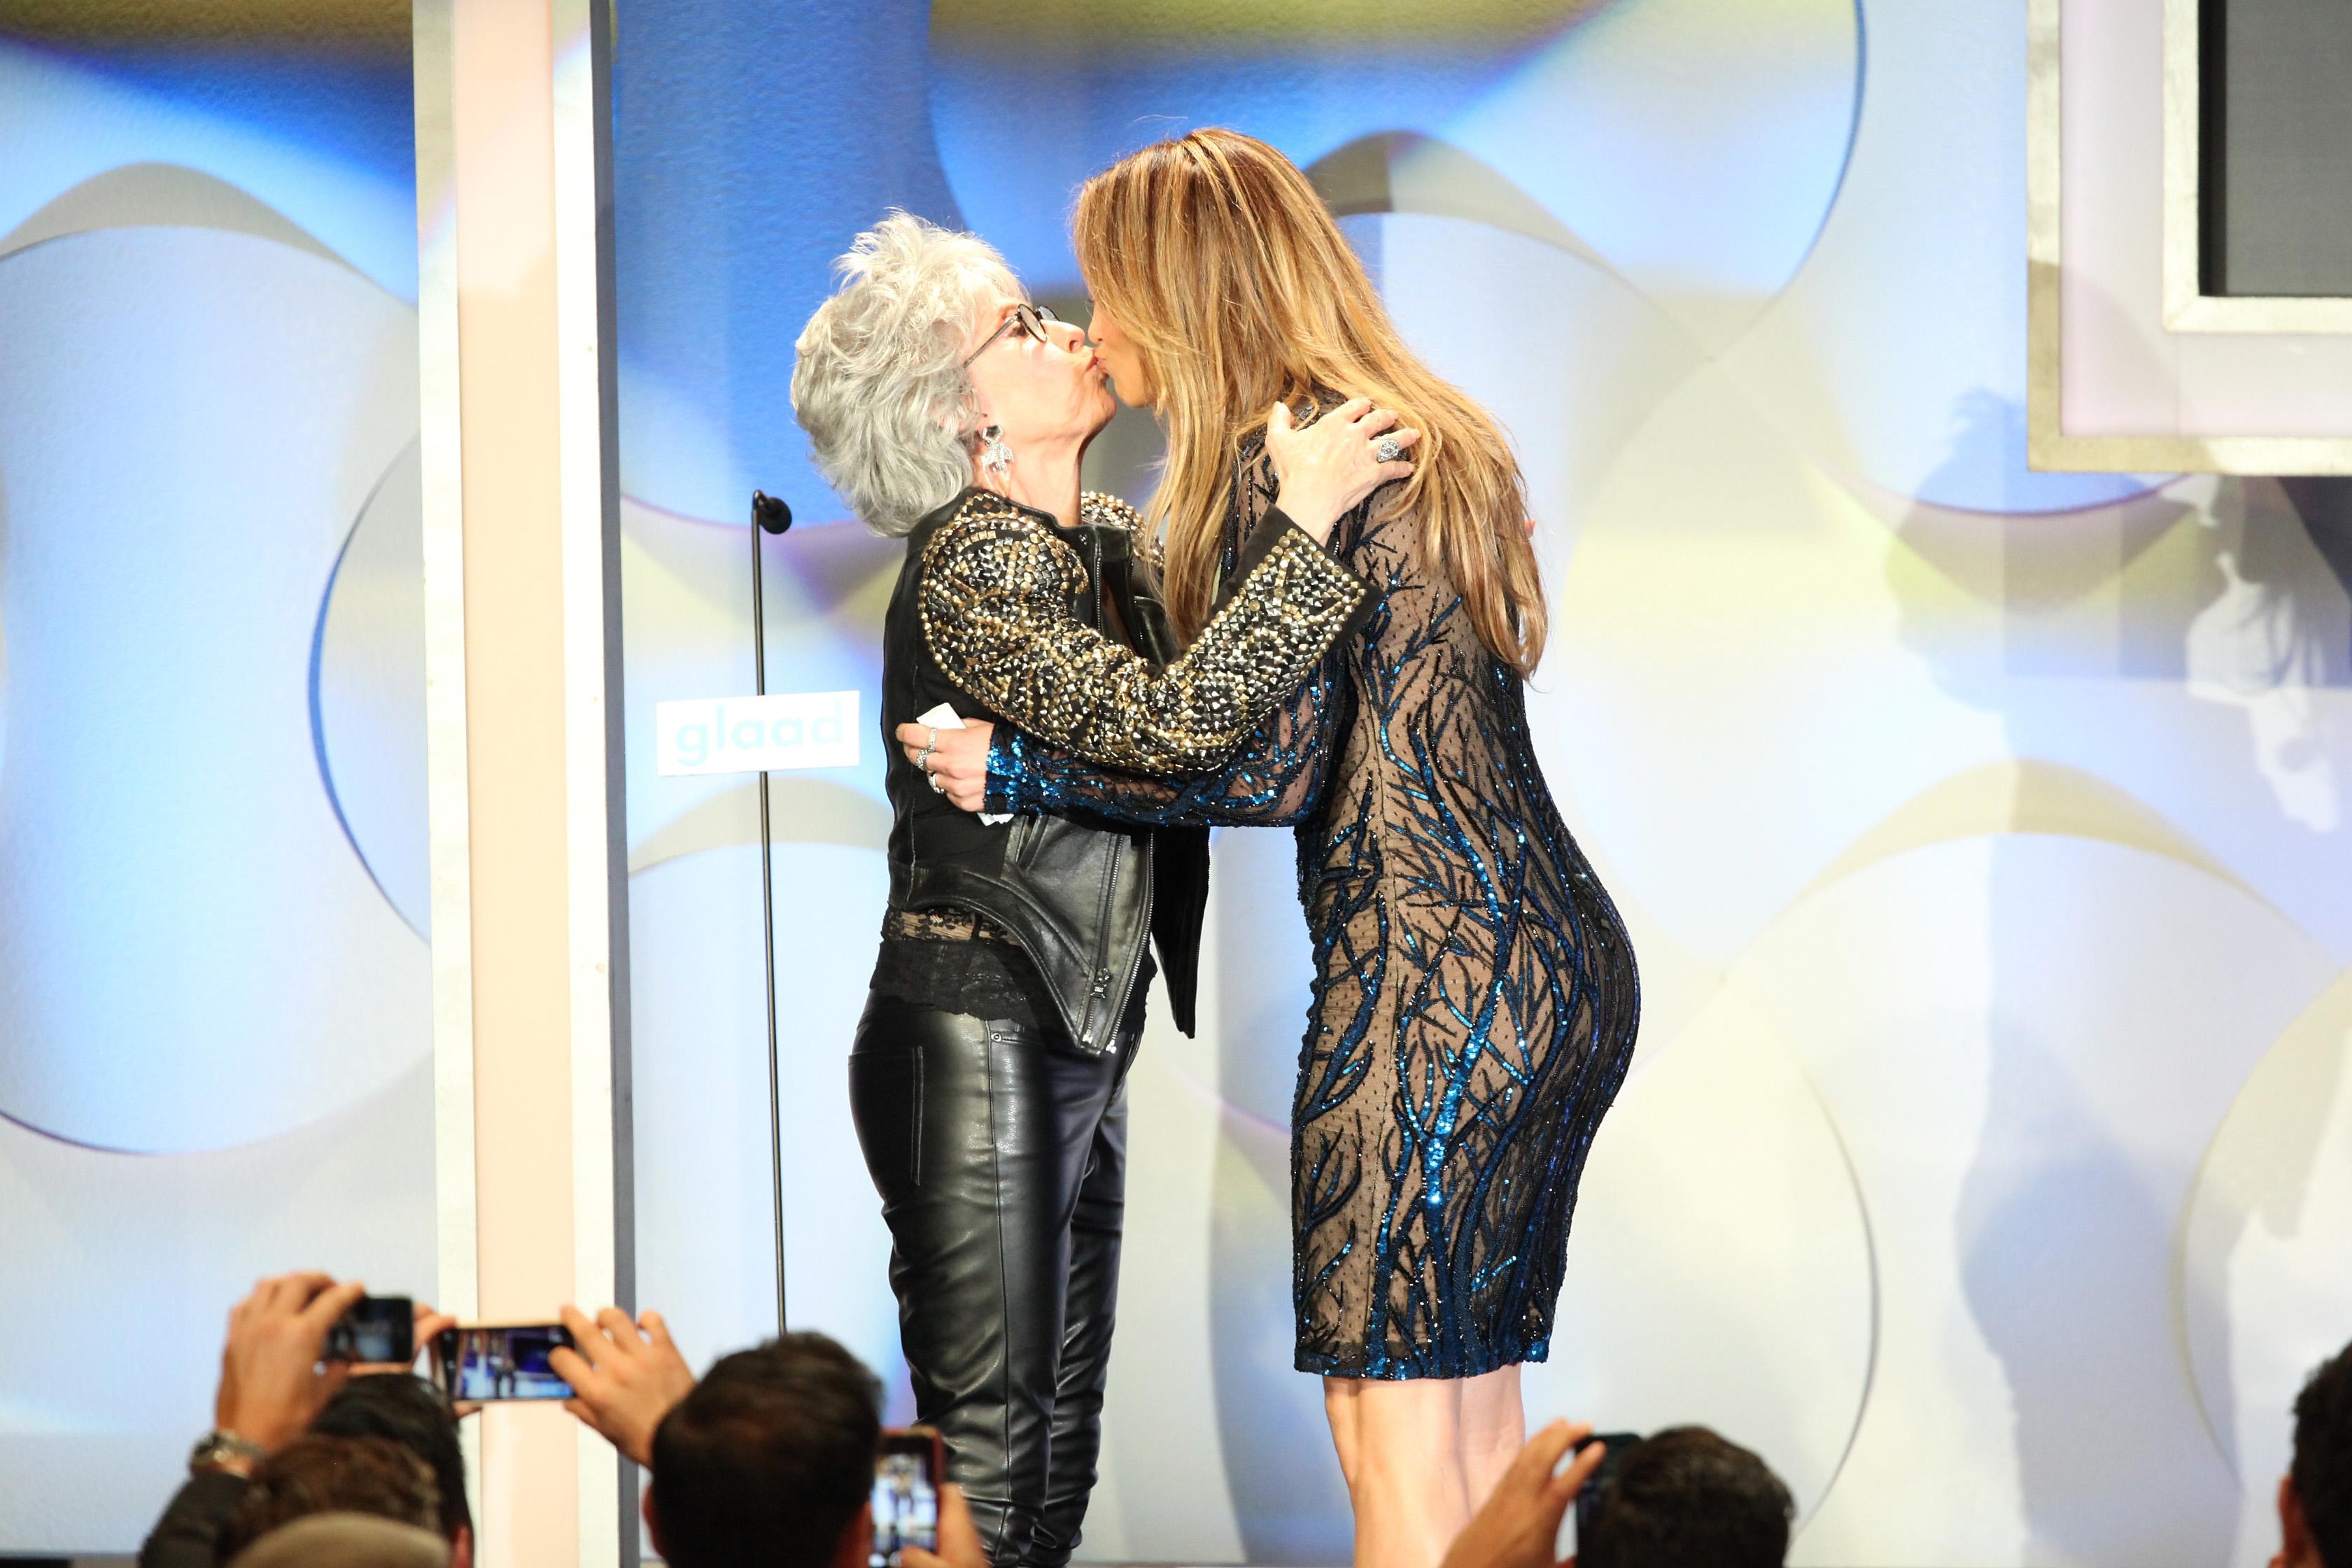 25th Annual GLAAD Media Awards - Show